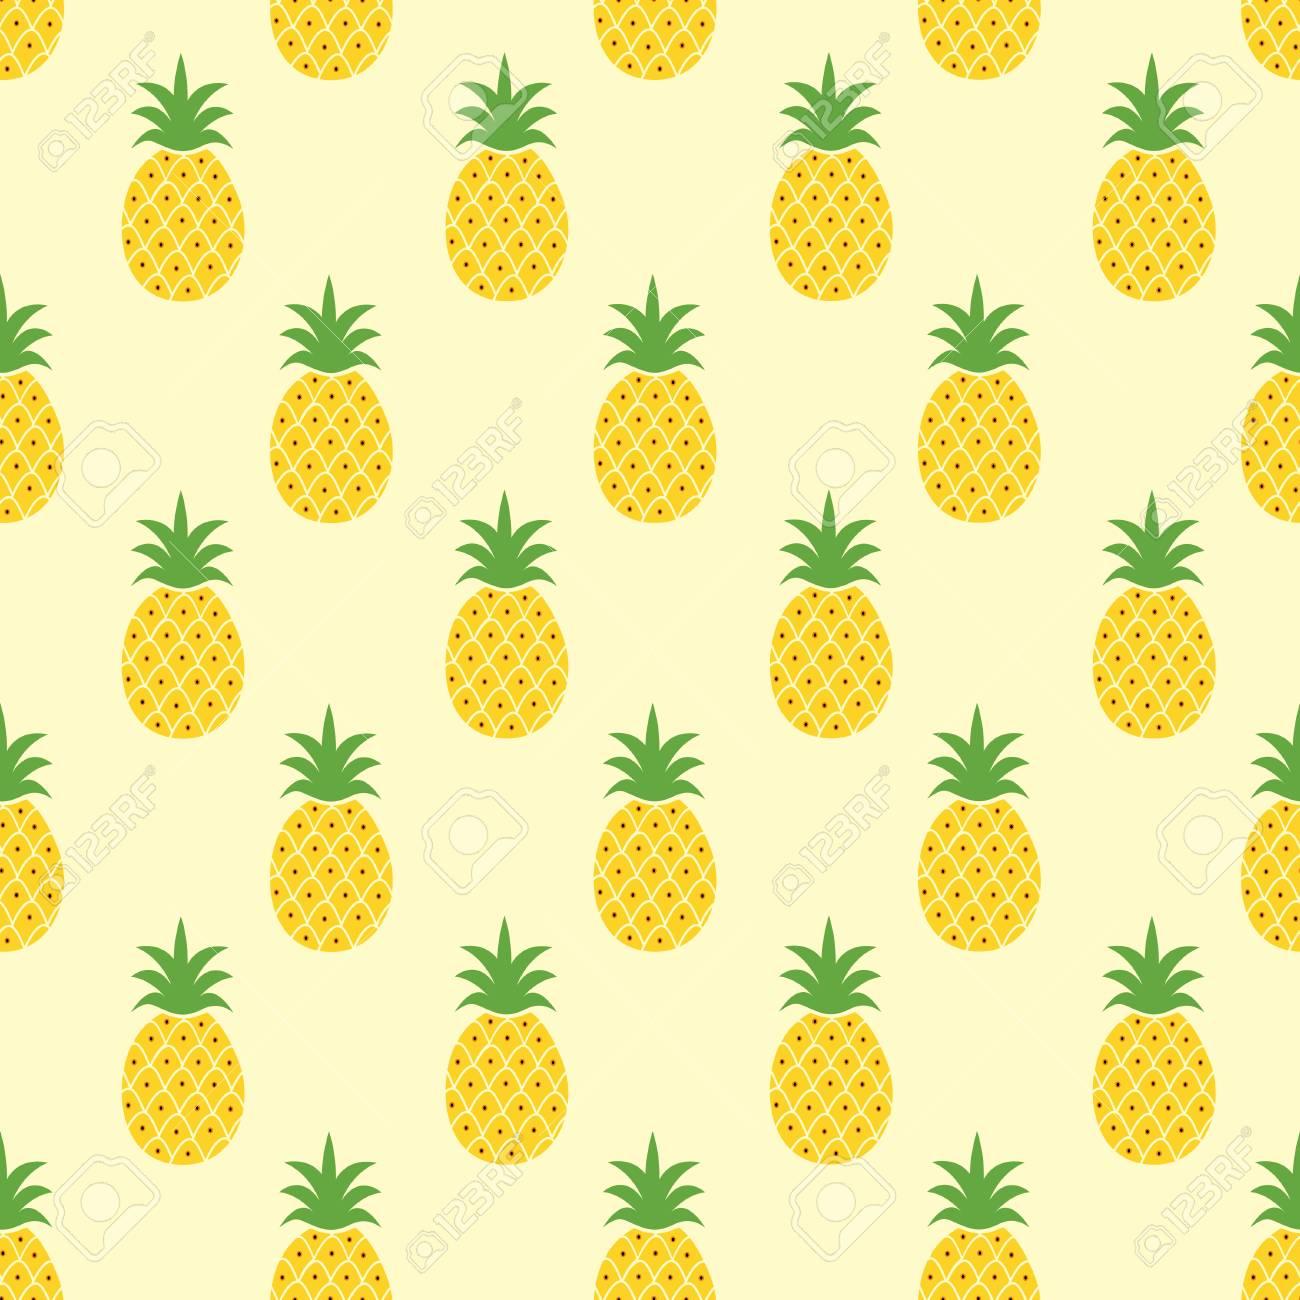 [19+] Pineapple Music Wallpapers on WallpaperSafari